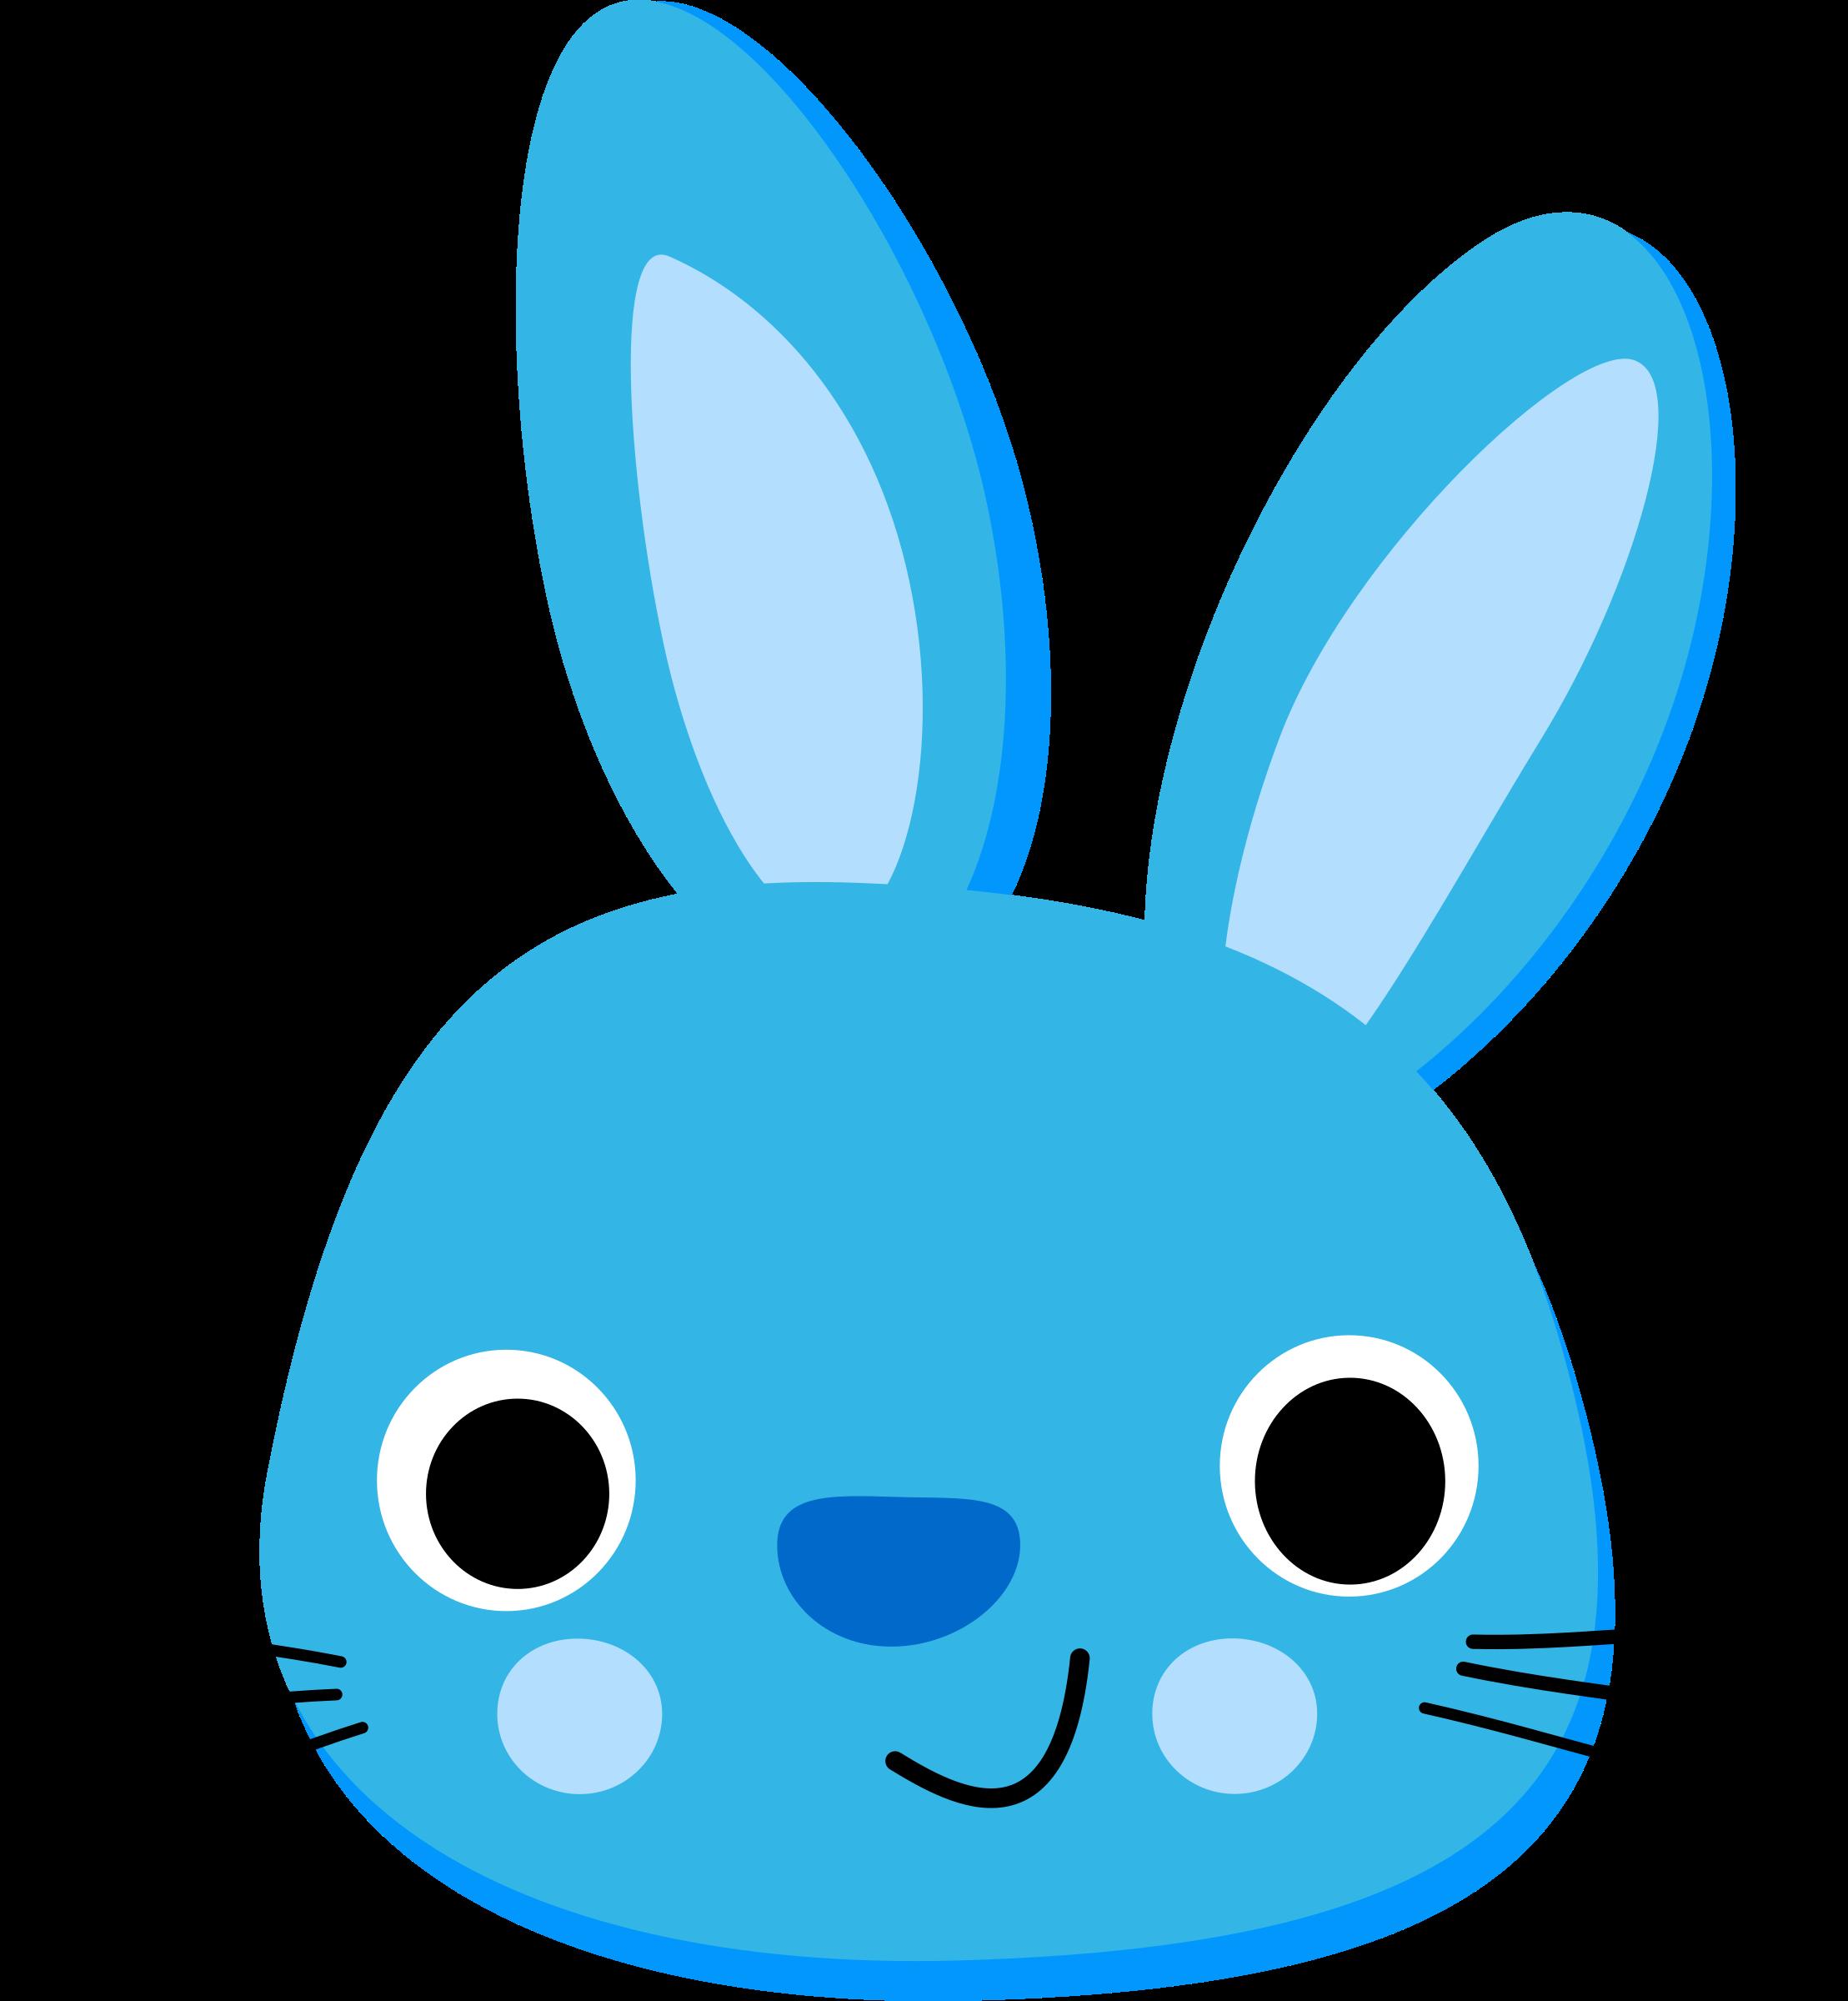 Clipart rabbit blue. Lapin bleu what s